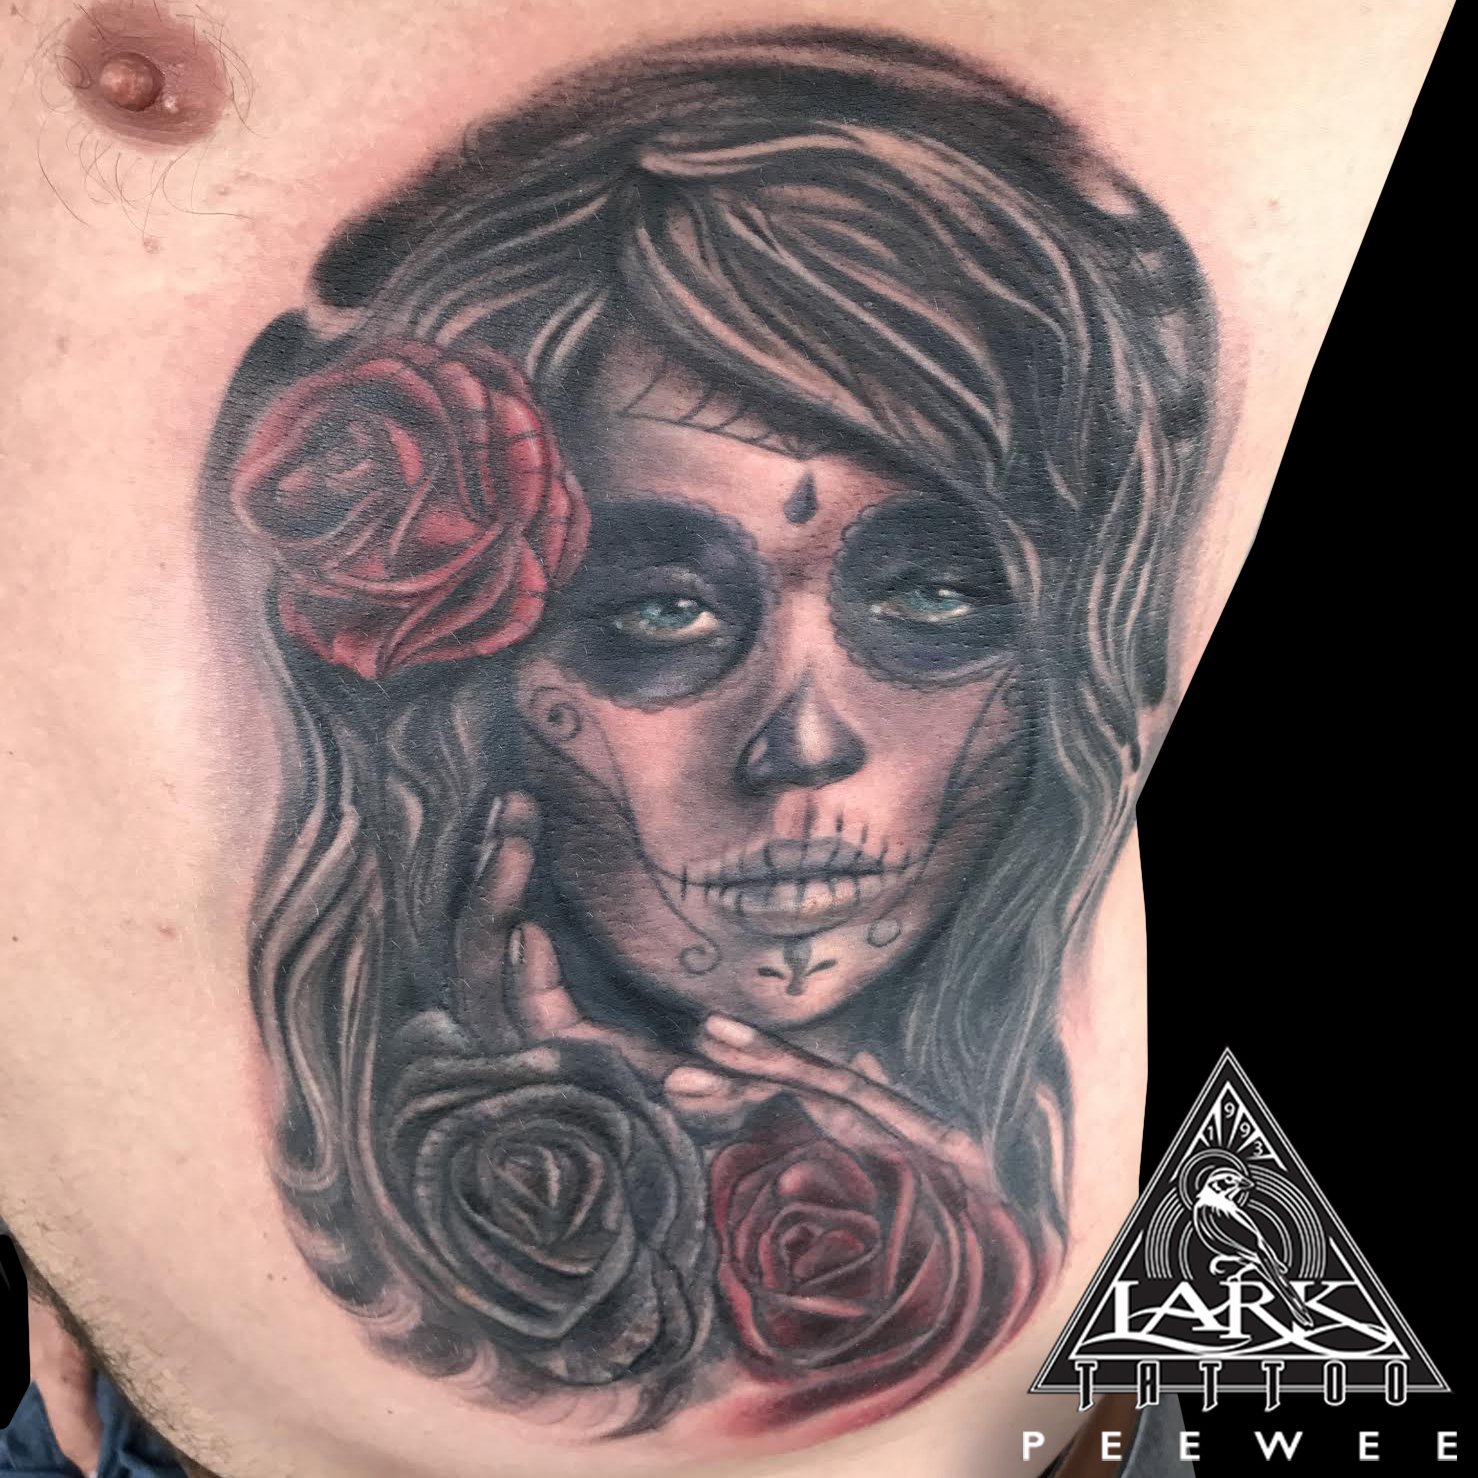 Peewee, DayOfTheDead, DayOfTheDeadTattoo, DíaDeMuertos, DíaDeMuertosTattoo, rose, rosetattoo, tattoo, tattoos, tat, tats, tatts, tatted, tattedup, tattoist, tattooed, inked, inkedup, ink, tattoooftheday, amazingink, bodyart, tattooig, tattoosofinstagram, instatats , larktattoo, larktattoos, larktattoowestbury, westbury, longisland, NY, NewYork, usa, art